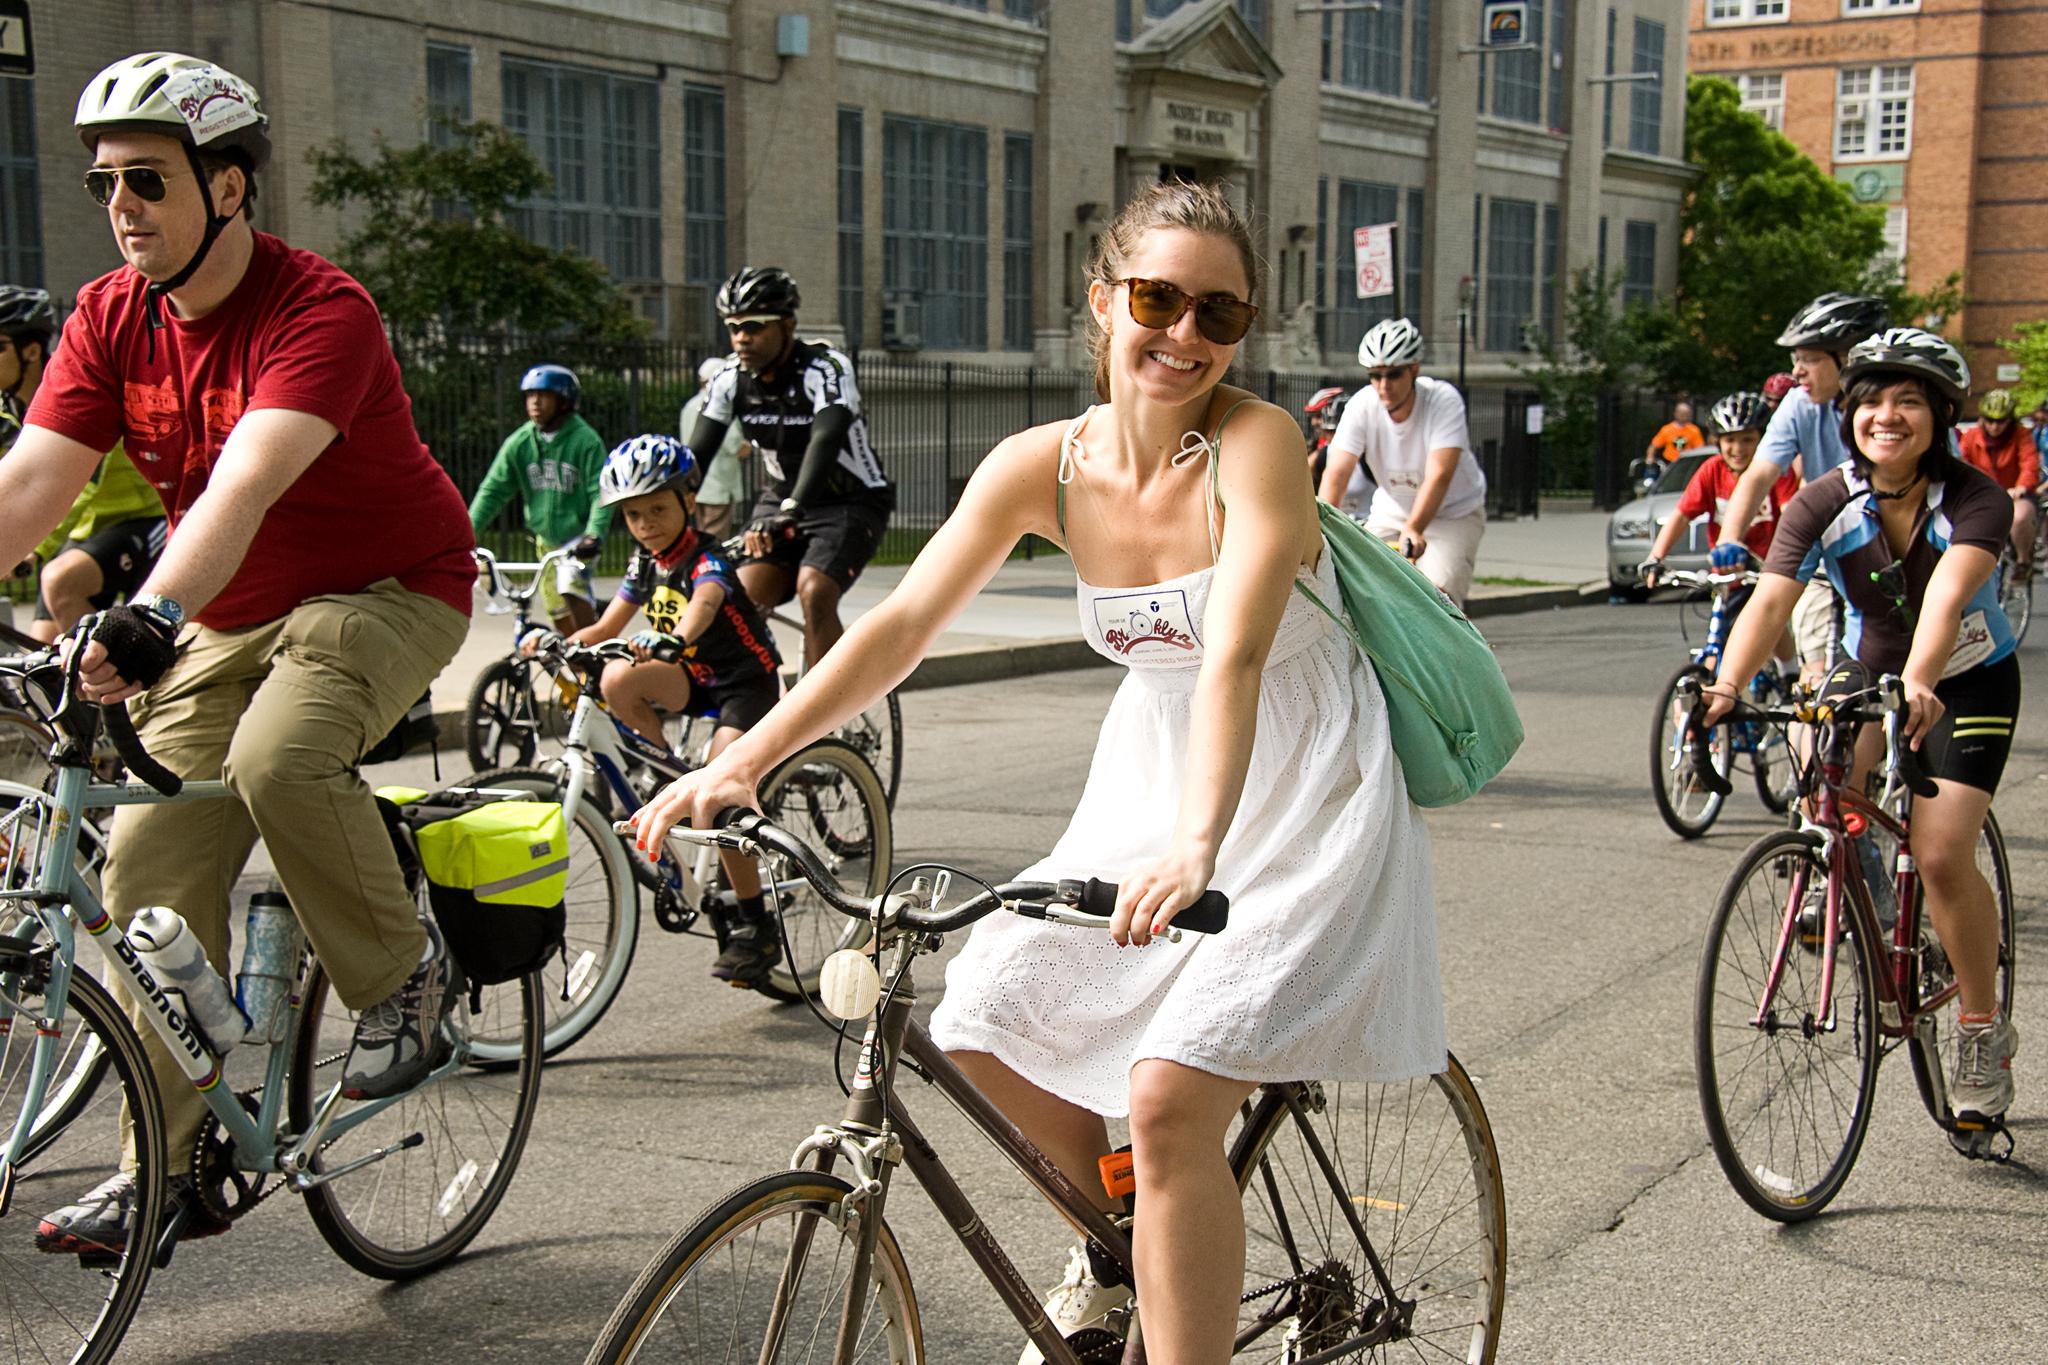 Ride during Bike Month